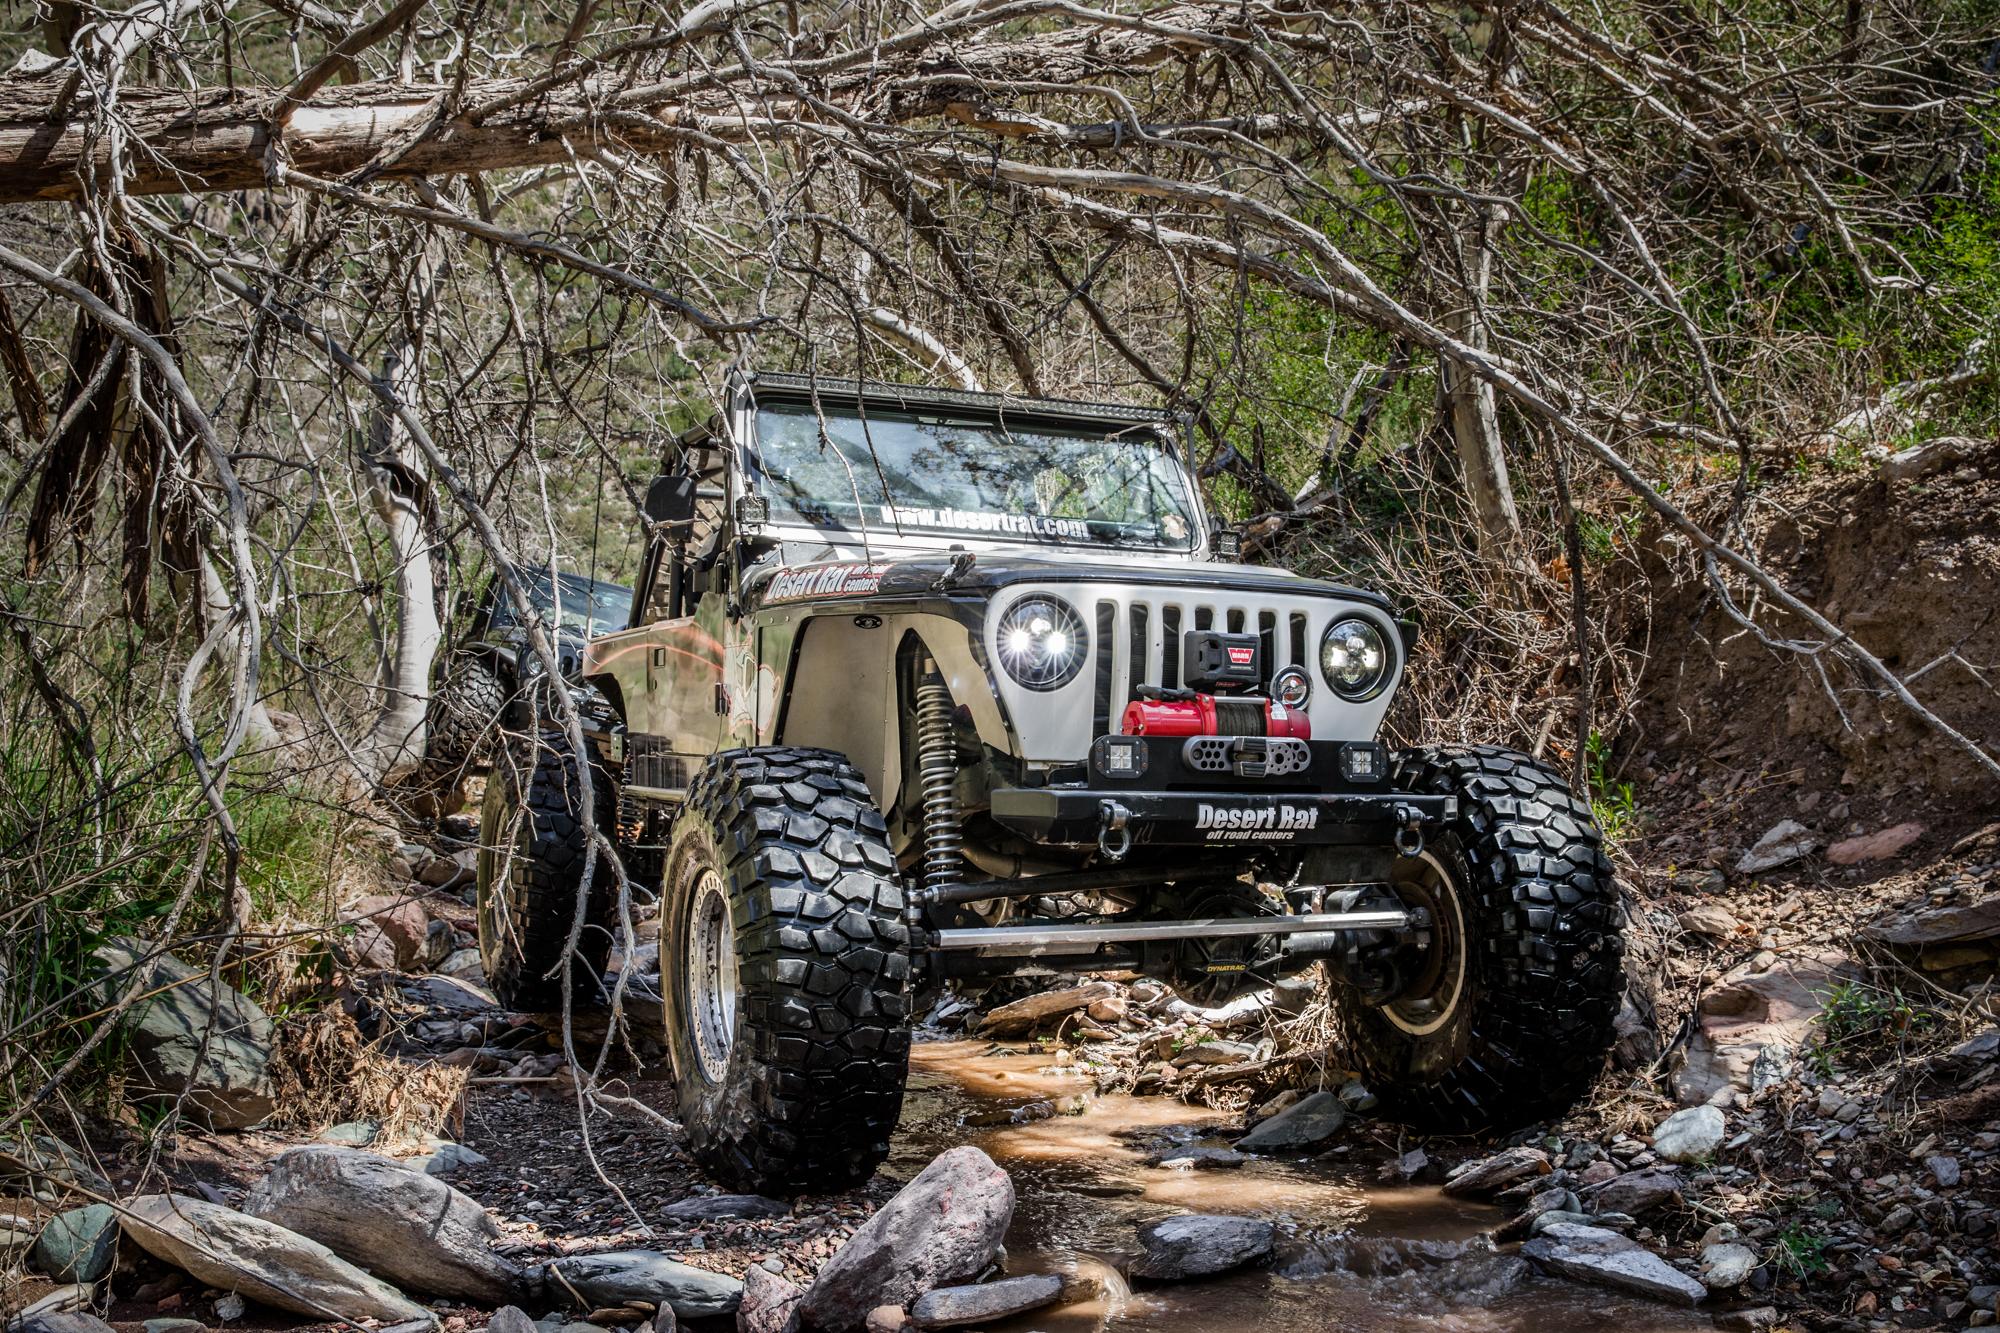 Jeeps Sycamore Creek 3_25_17 WEB-17.jpg